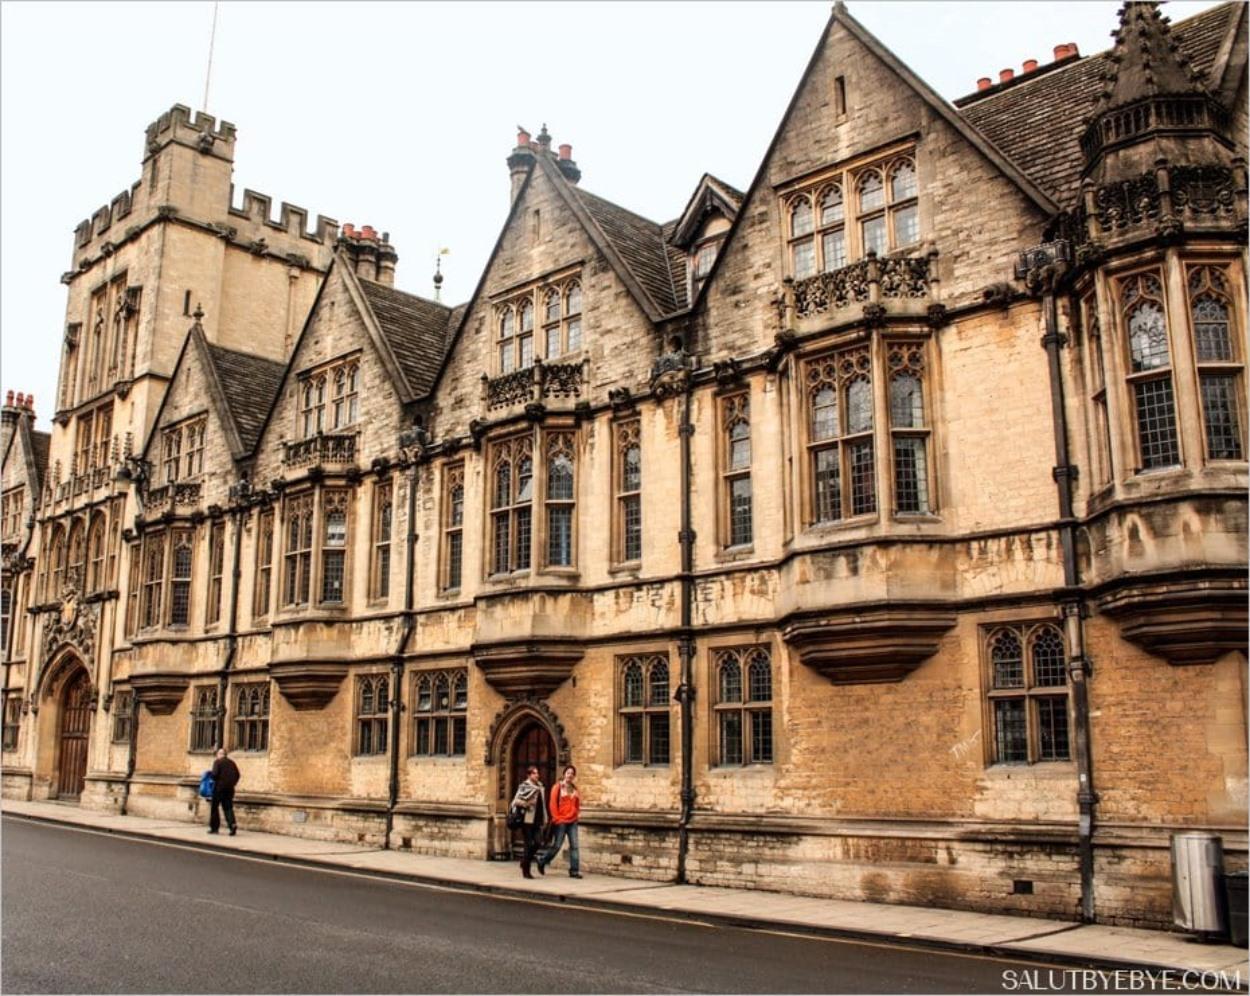 Dans les rues d'Oxford en Angleterre